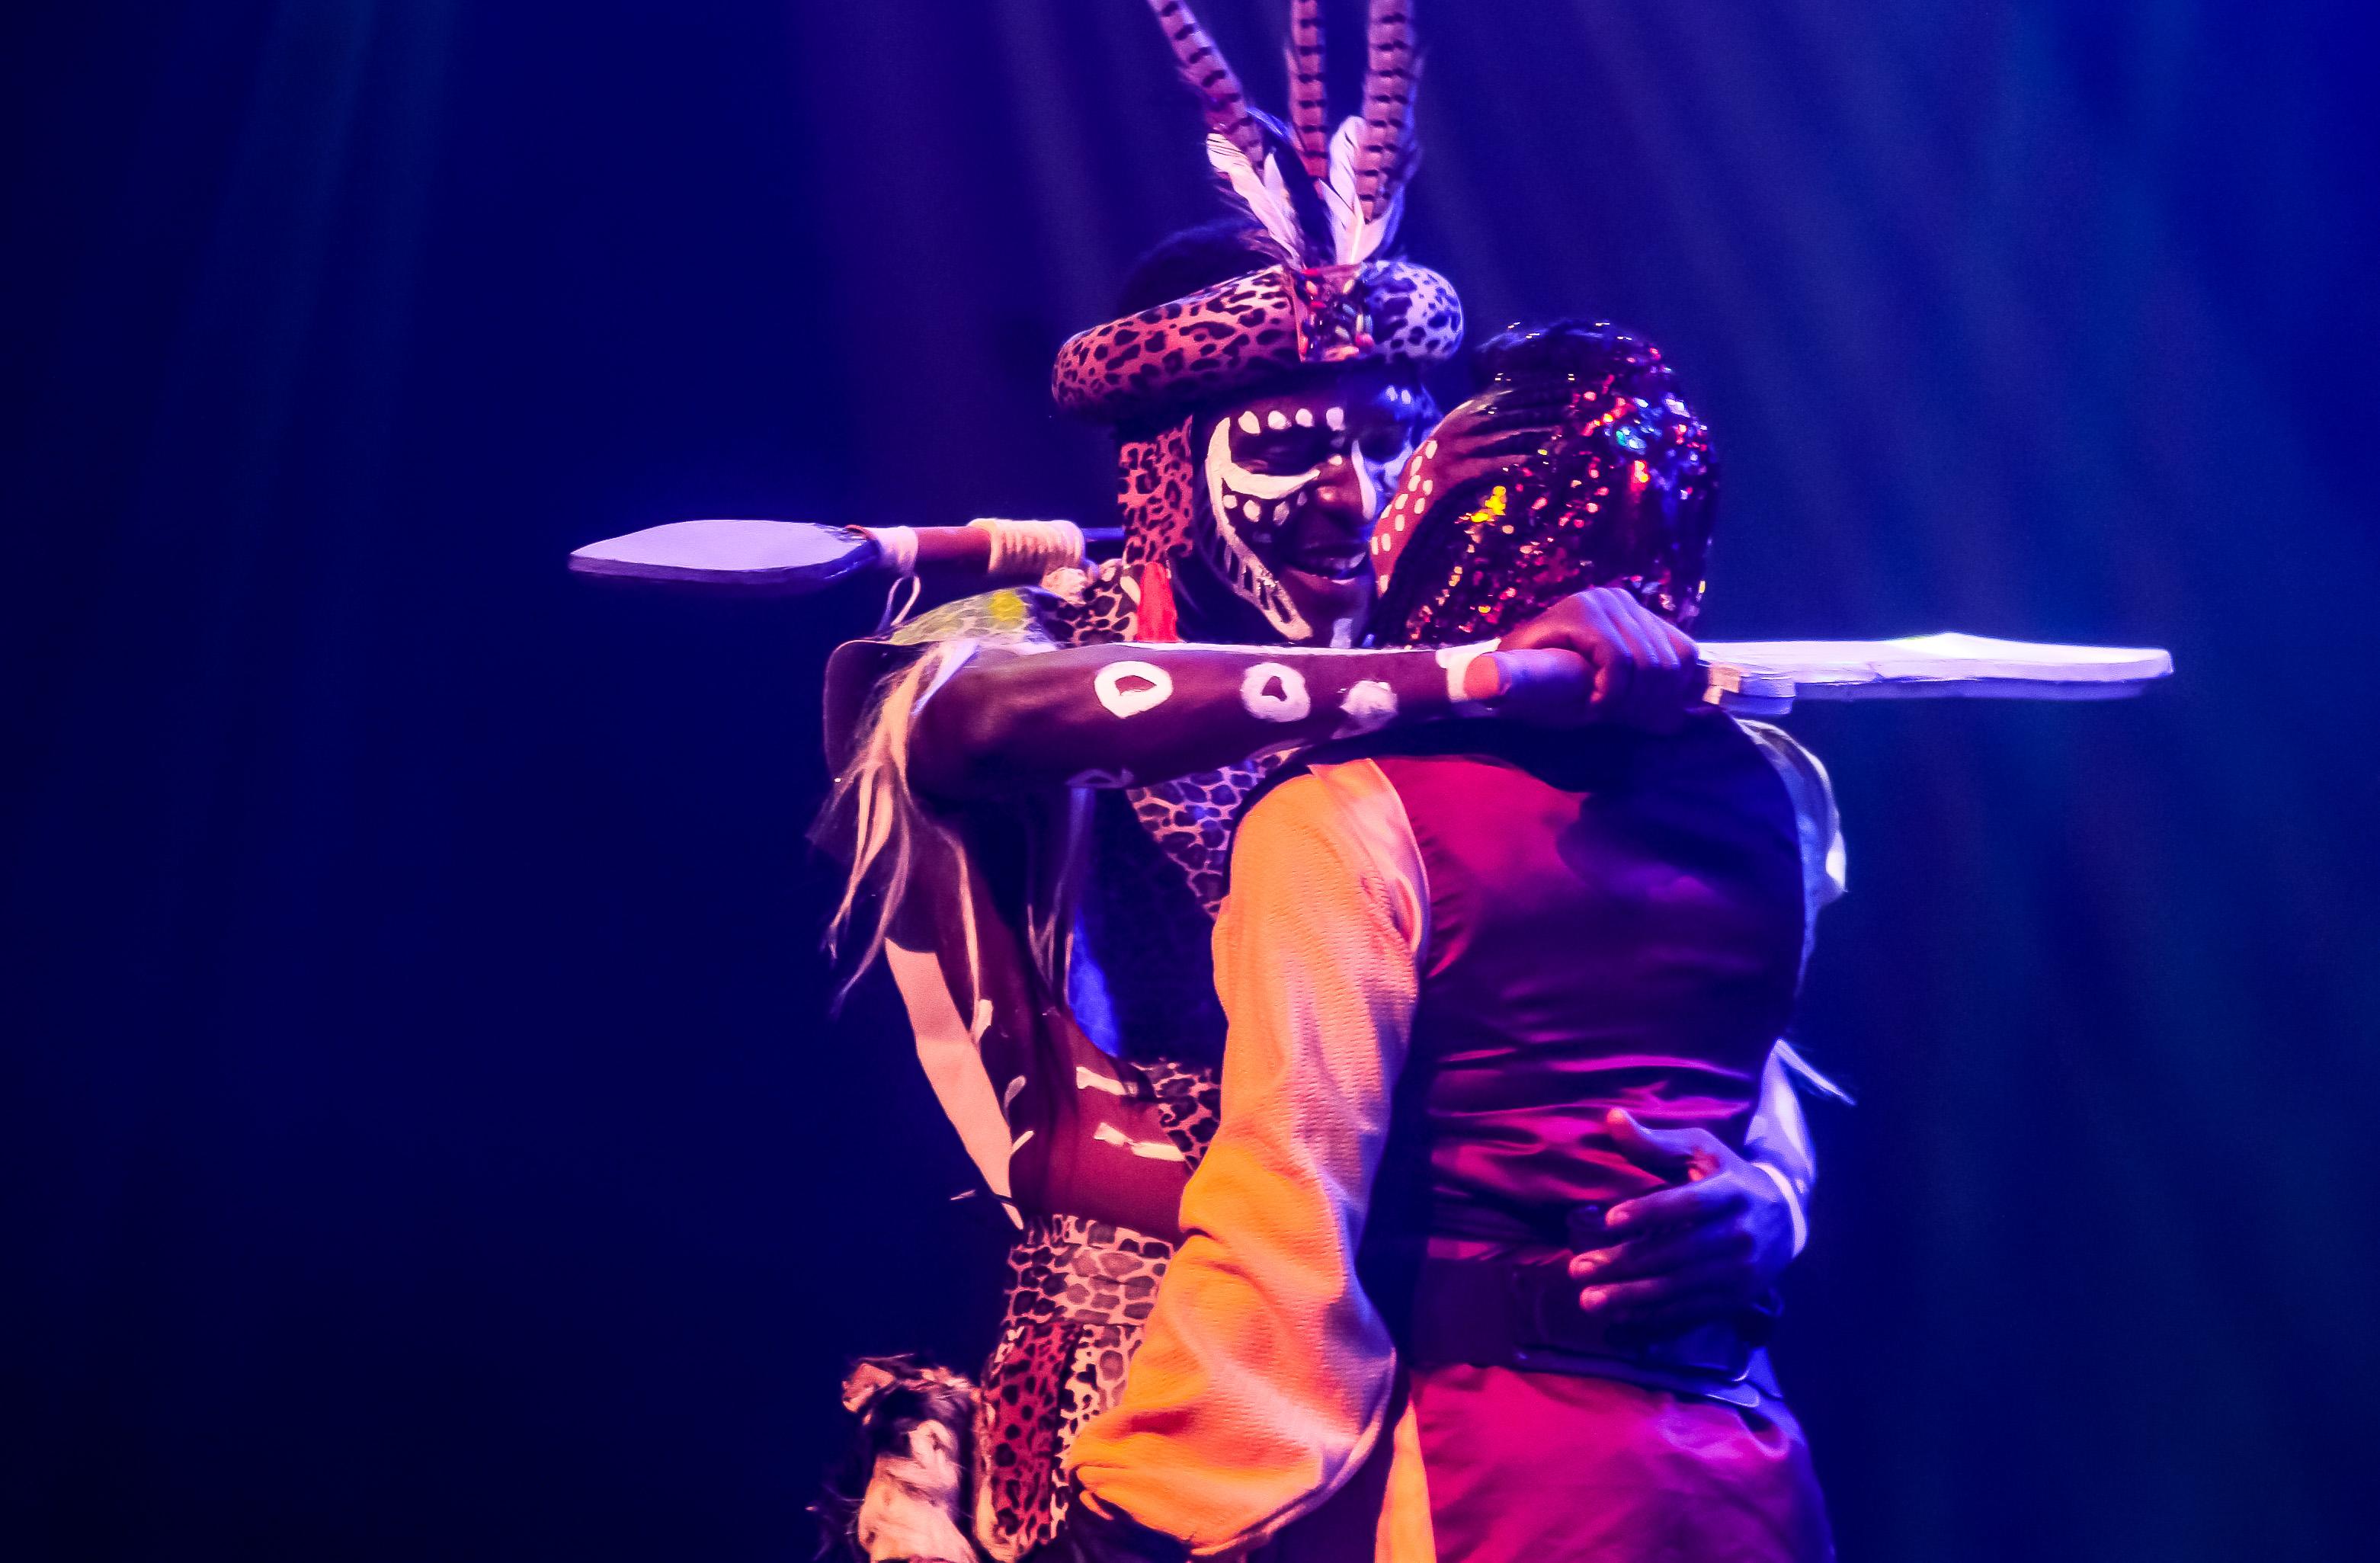 Gbenga Yusuf